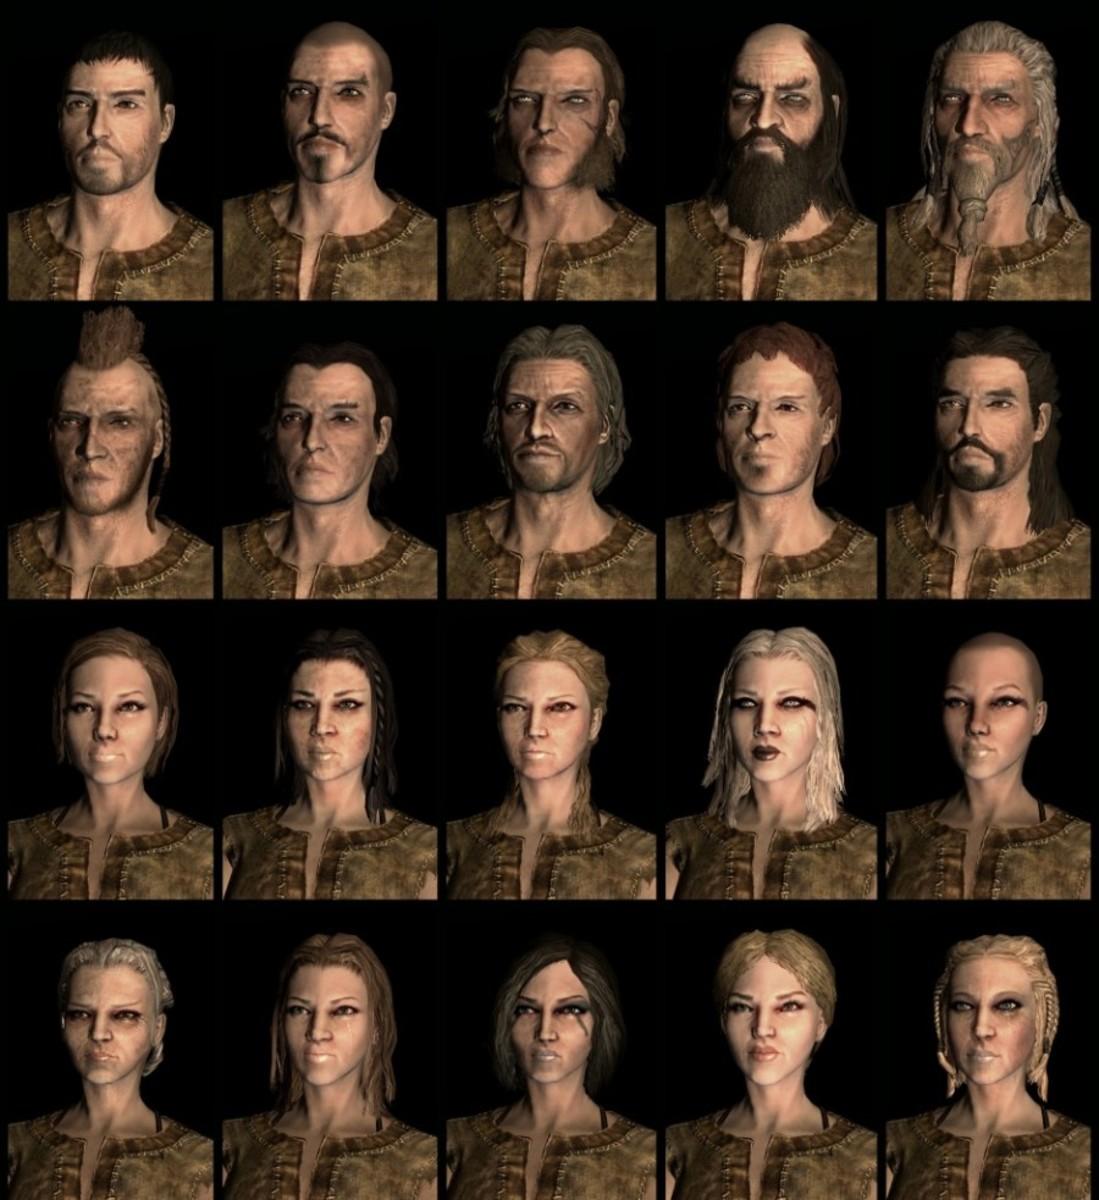 Compilation of Skyrim Breton Race faces